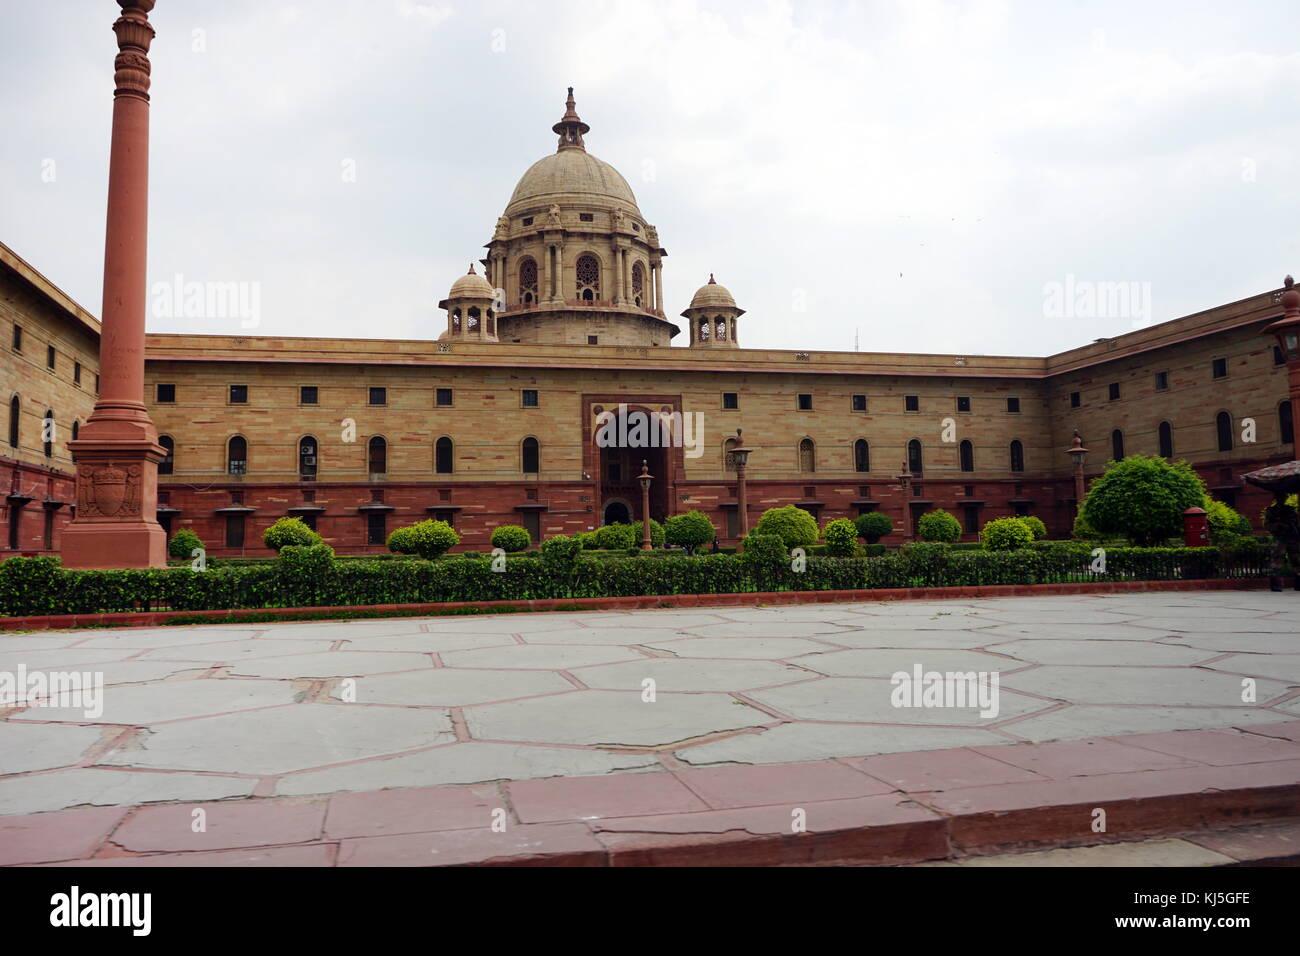 Government buildings new delhi stock photos government buildings new delhi stock images alamy - Cabinet secretariat govt of india ...